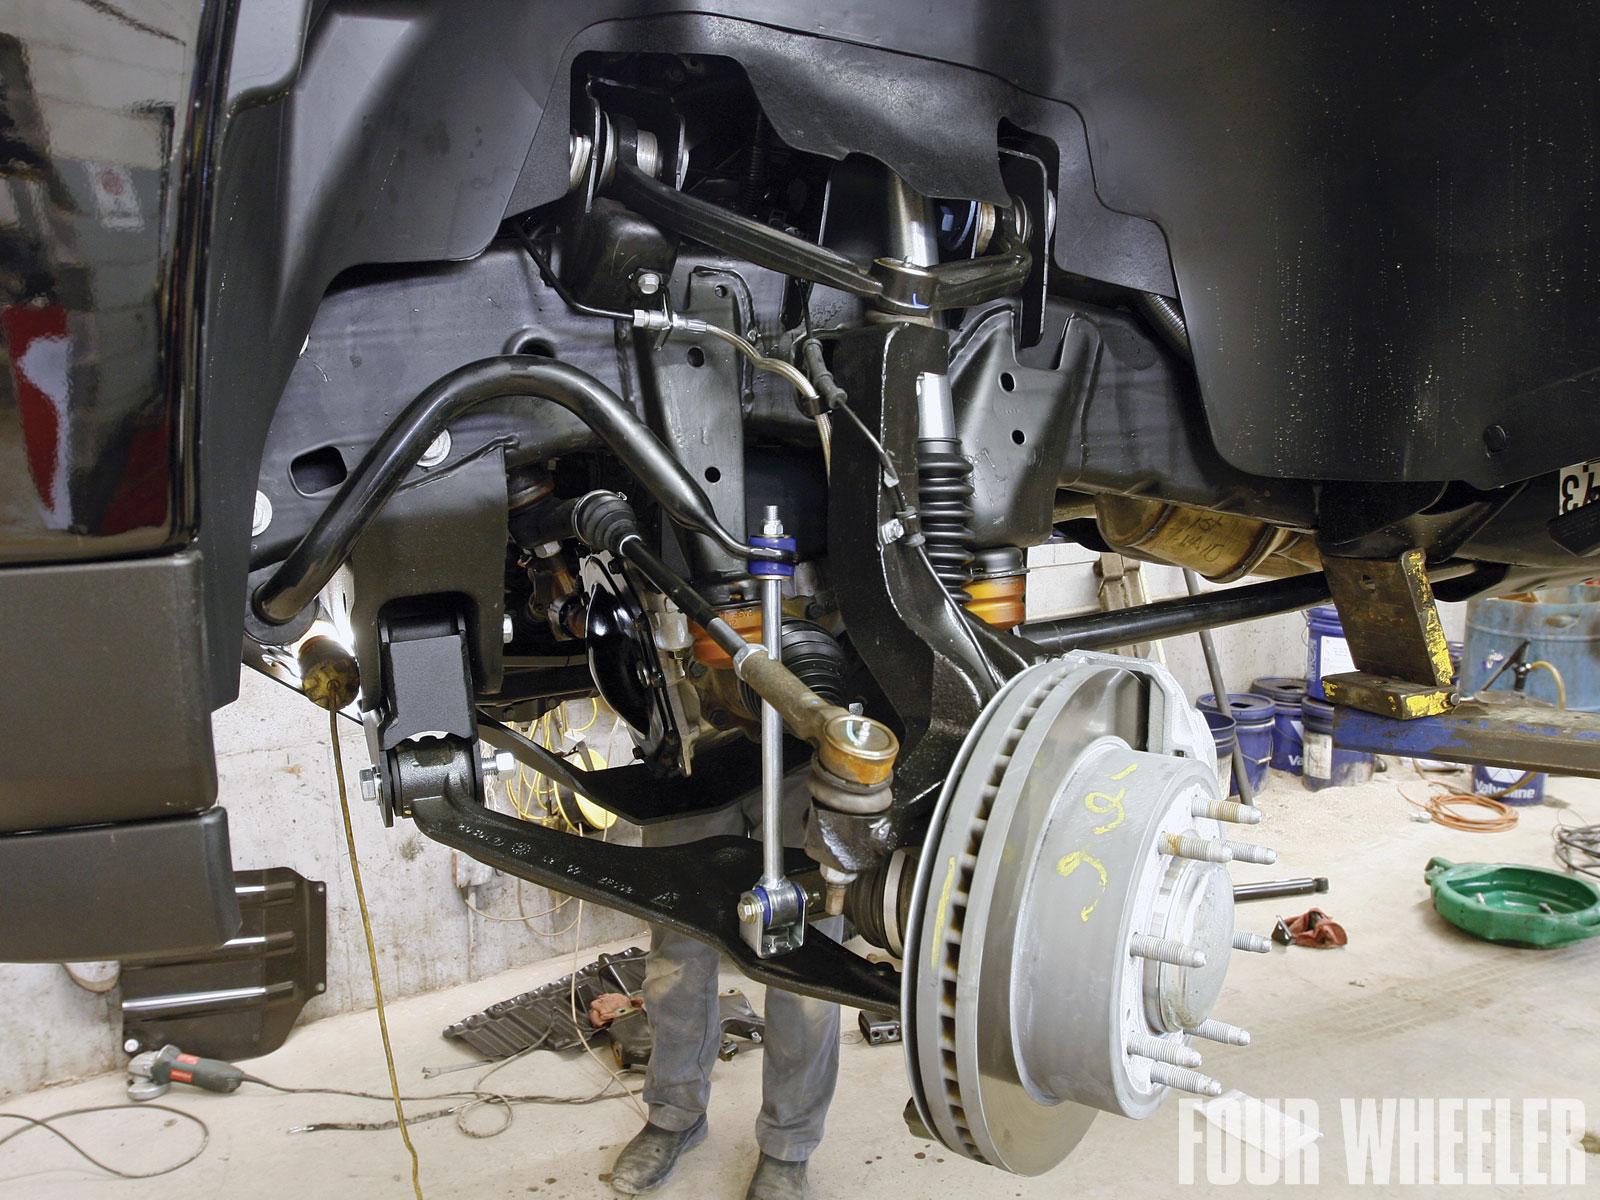 2012 Dodge Ram 2500 Parts Diagram Schematic Diagrams Trailer Wiring 3500 Front Suspension Trusted 2005